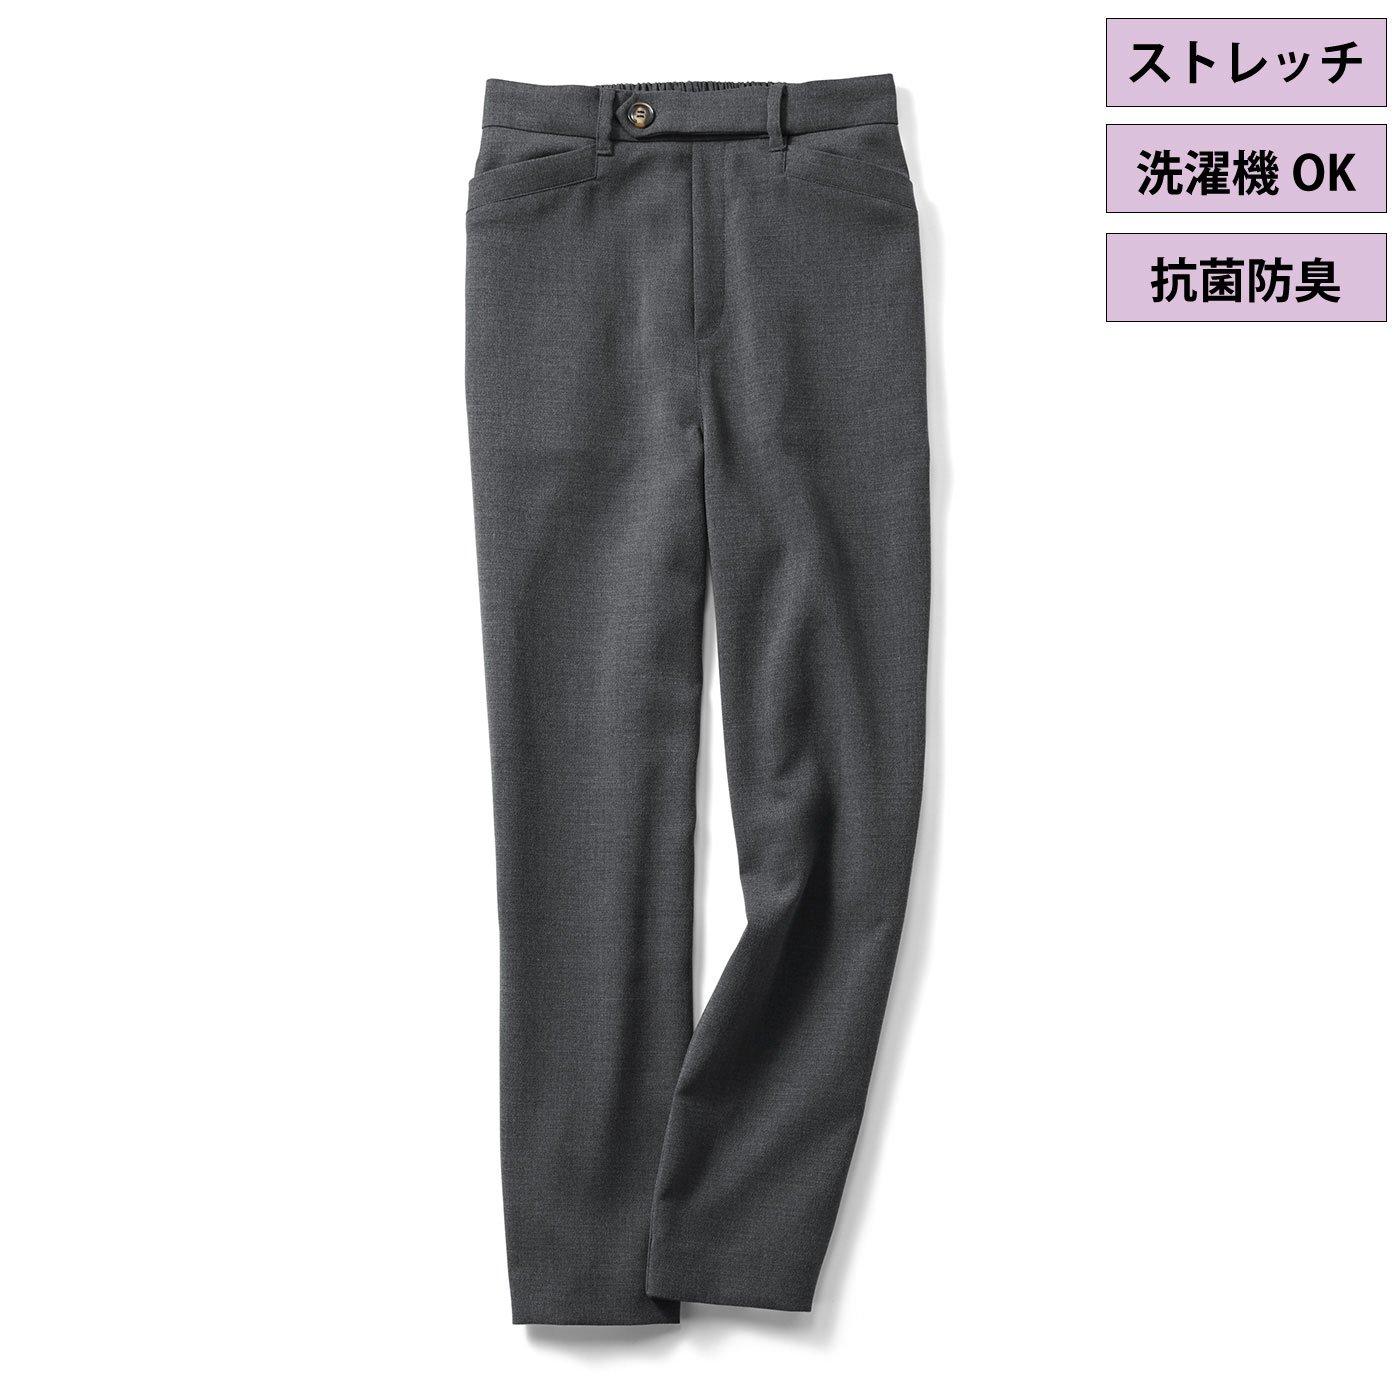 IEDIT[イディット] 抗菌防臭機能がうれしい 布はく素材のバレエフィット(R)パンツ〈グレー〉